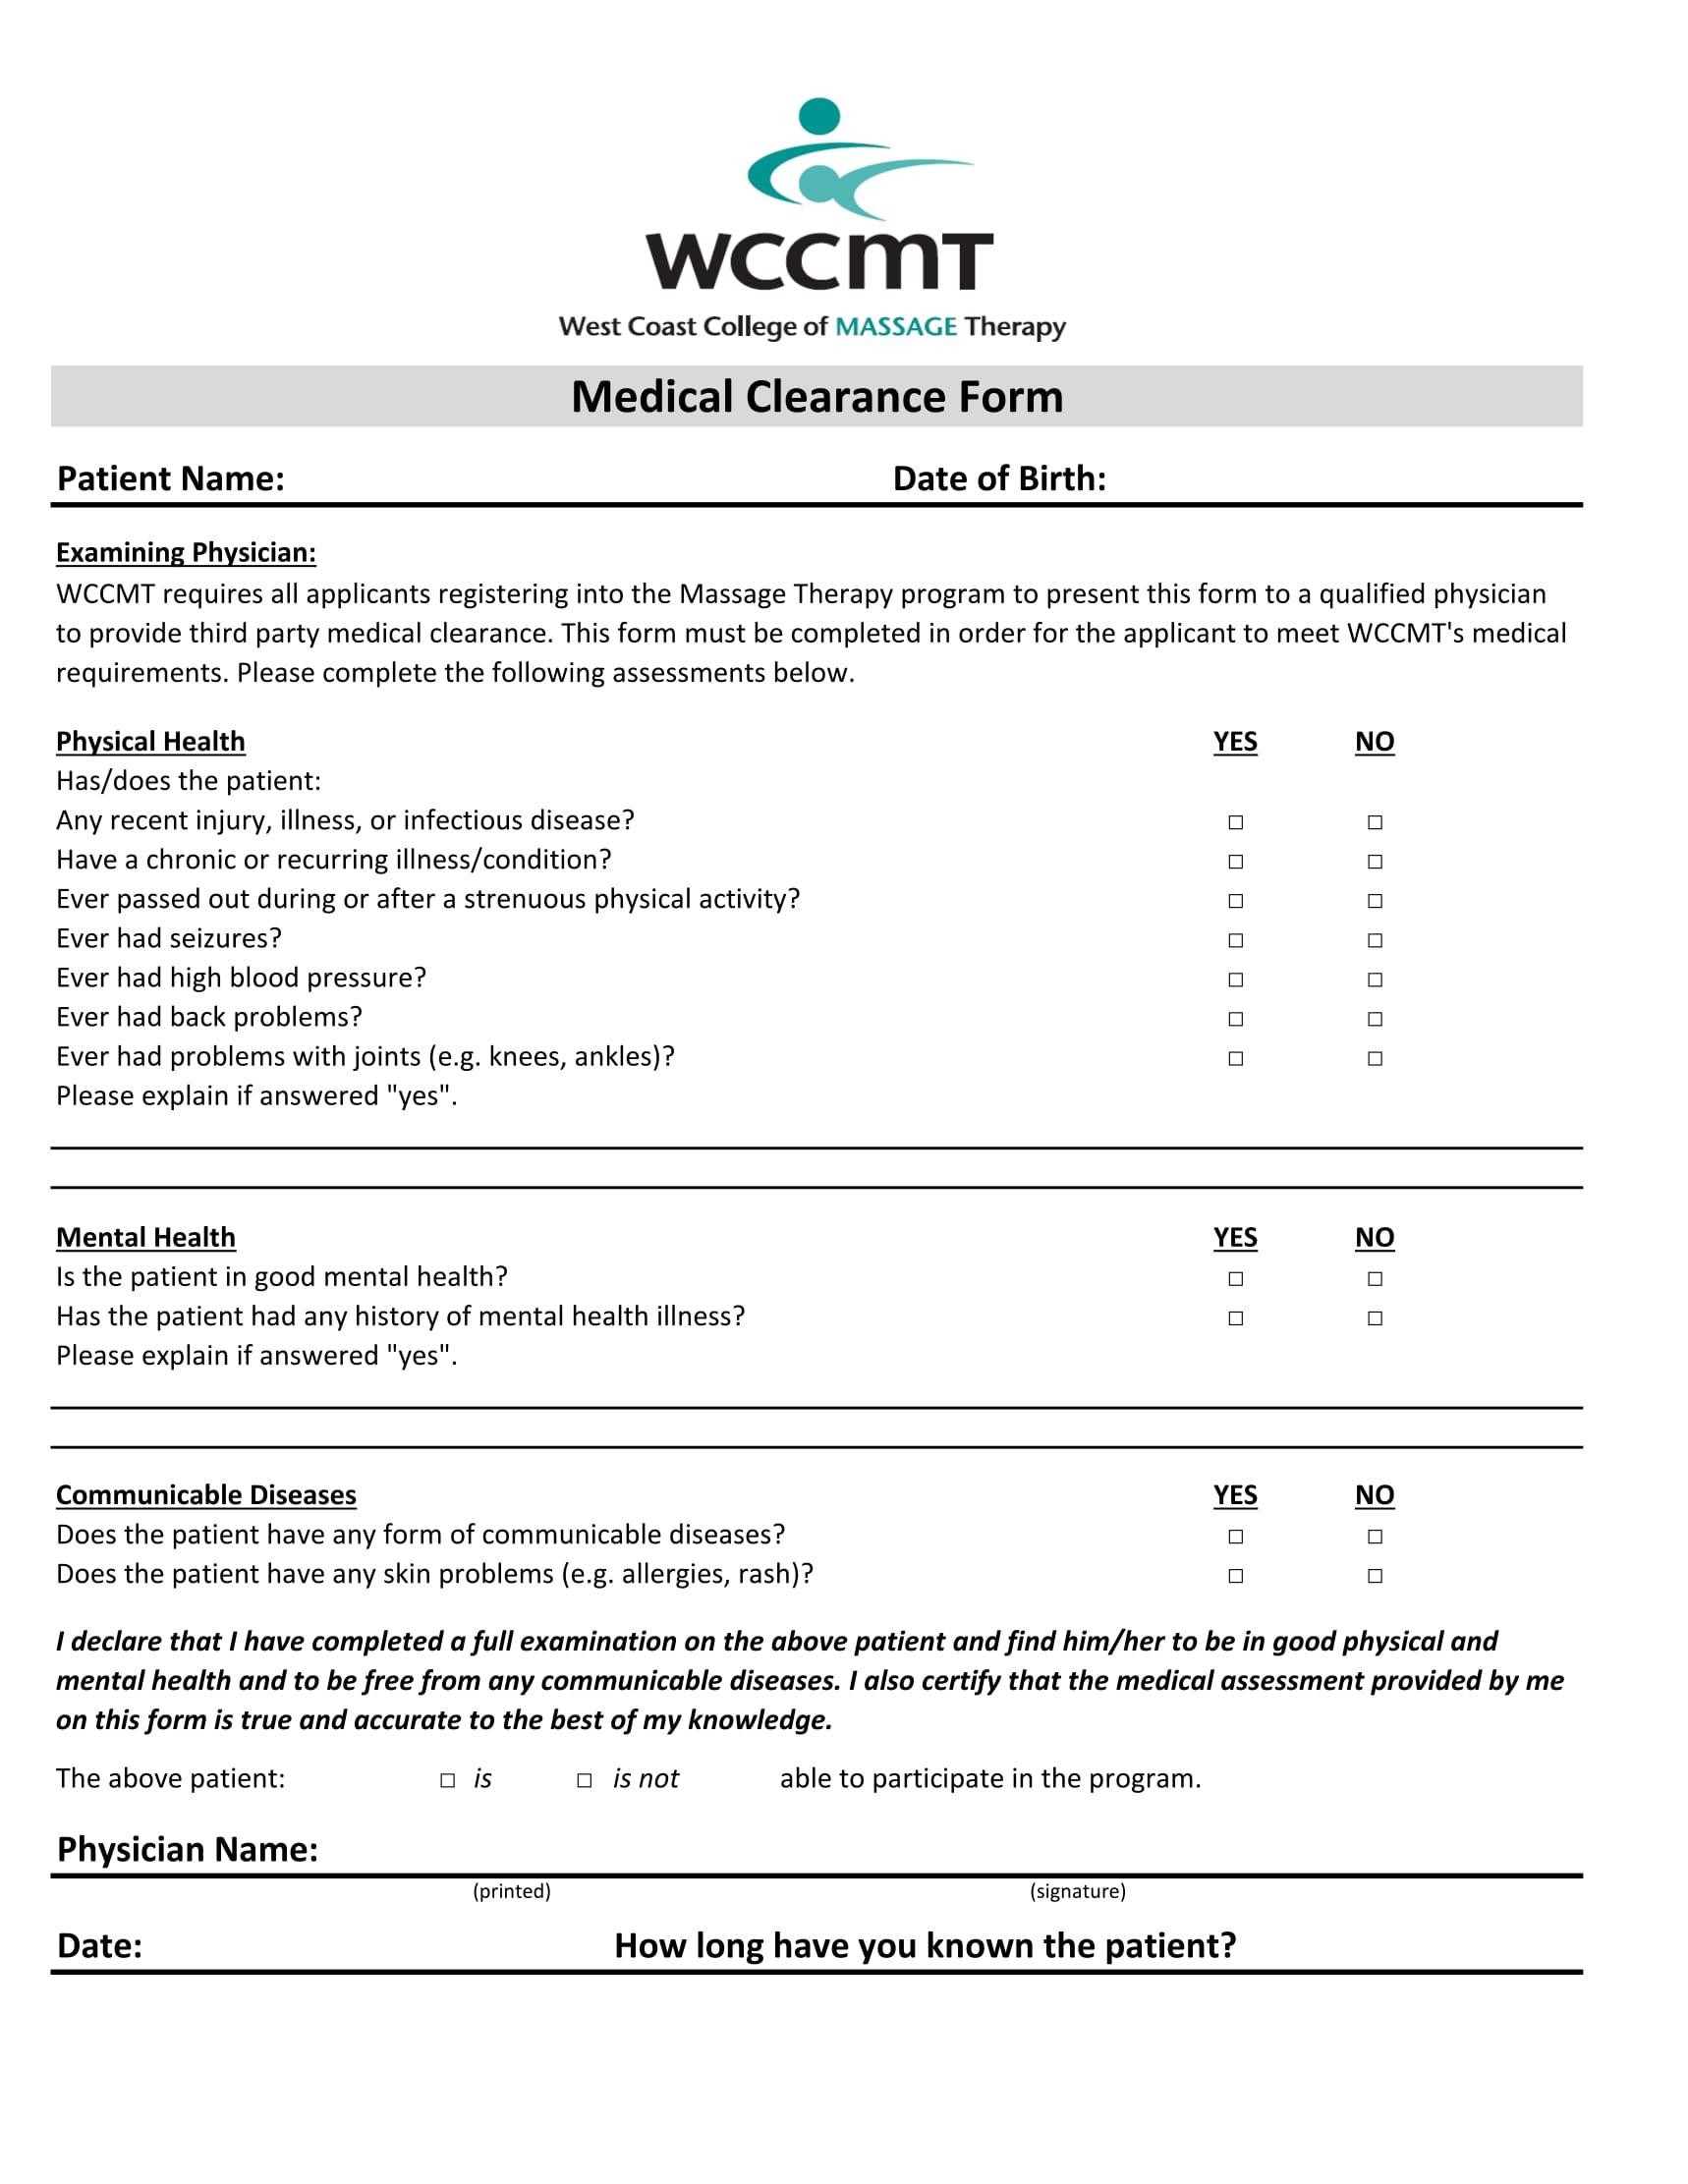 massage medical clearance form 1